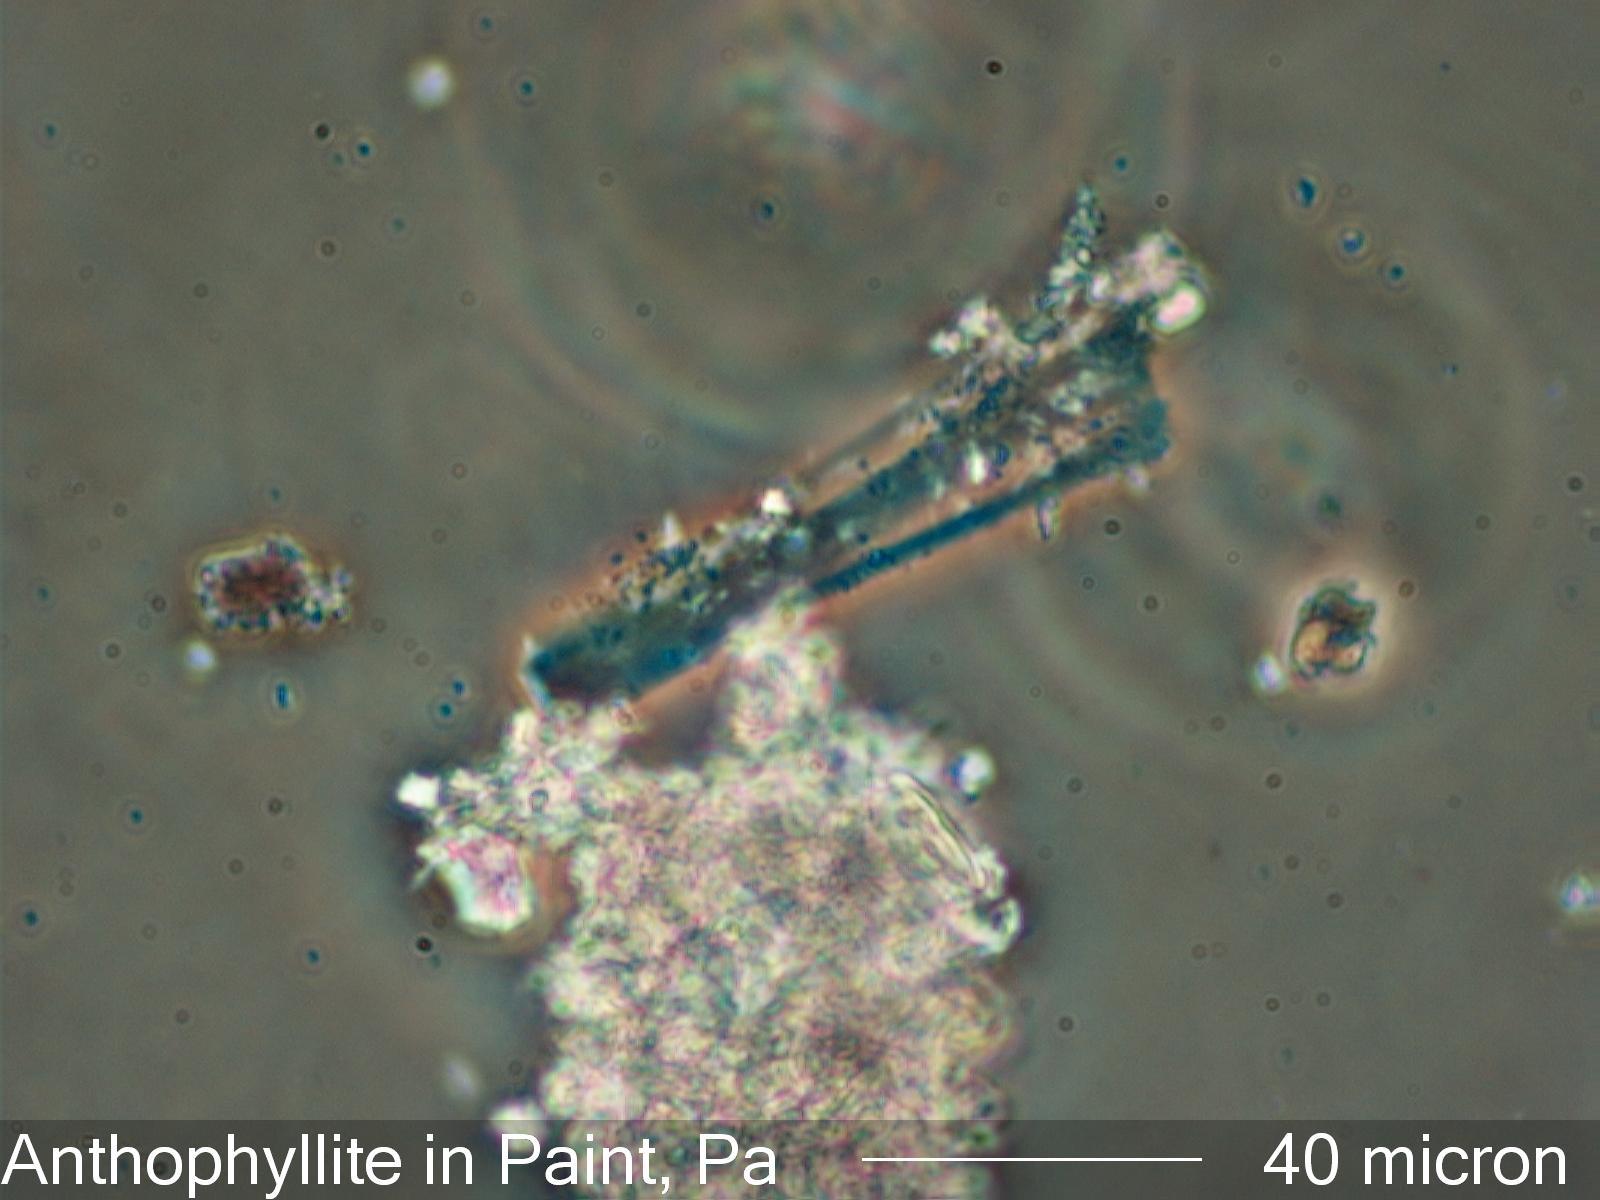 Asbestos Fibers Under Microscope : Anthophyllite under the microscope